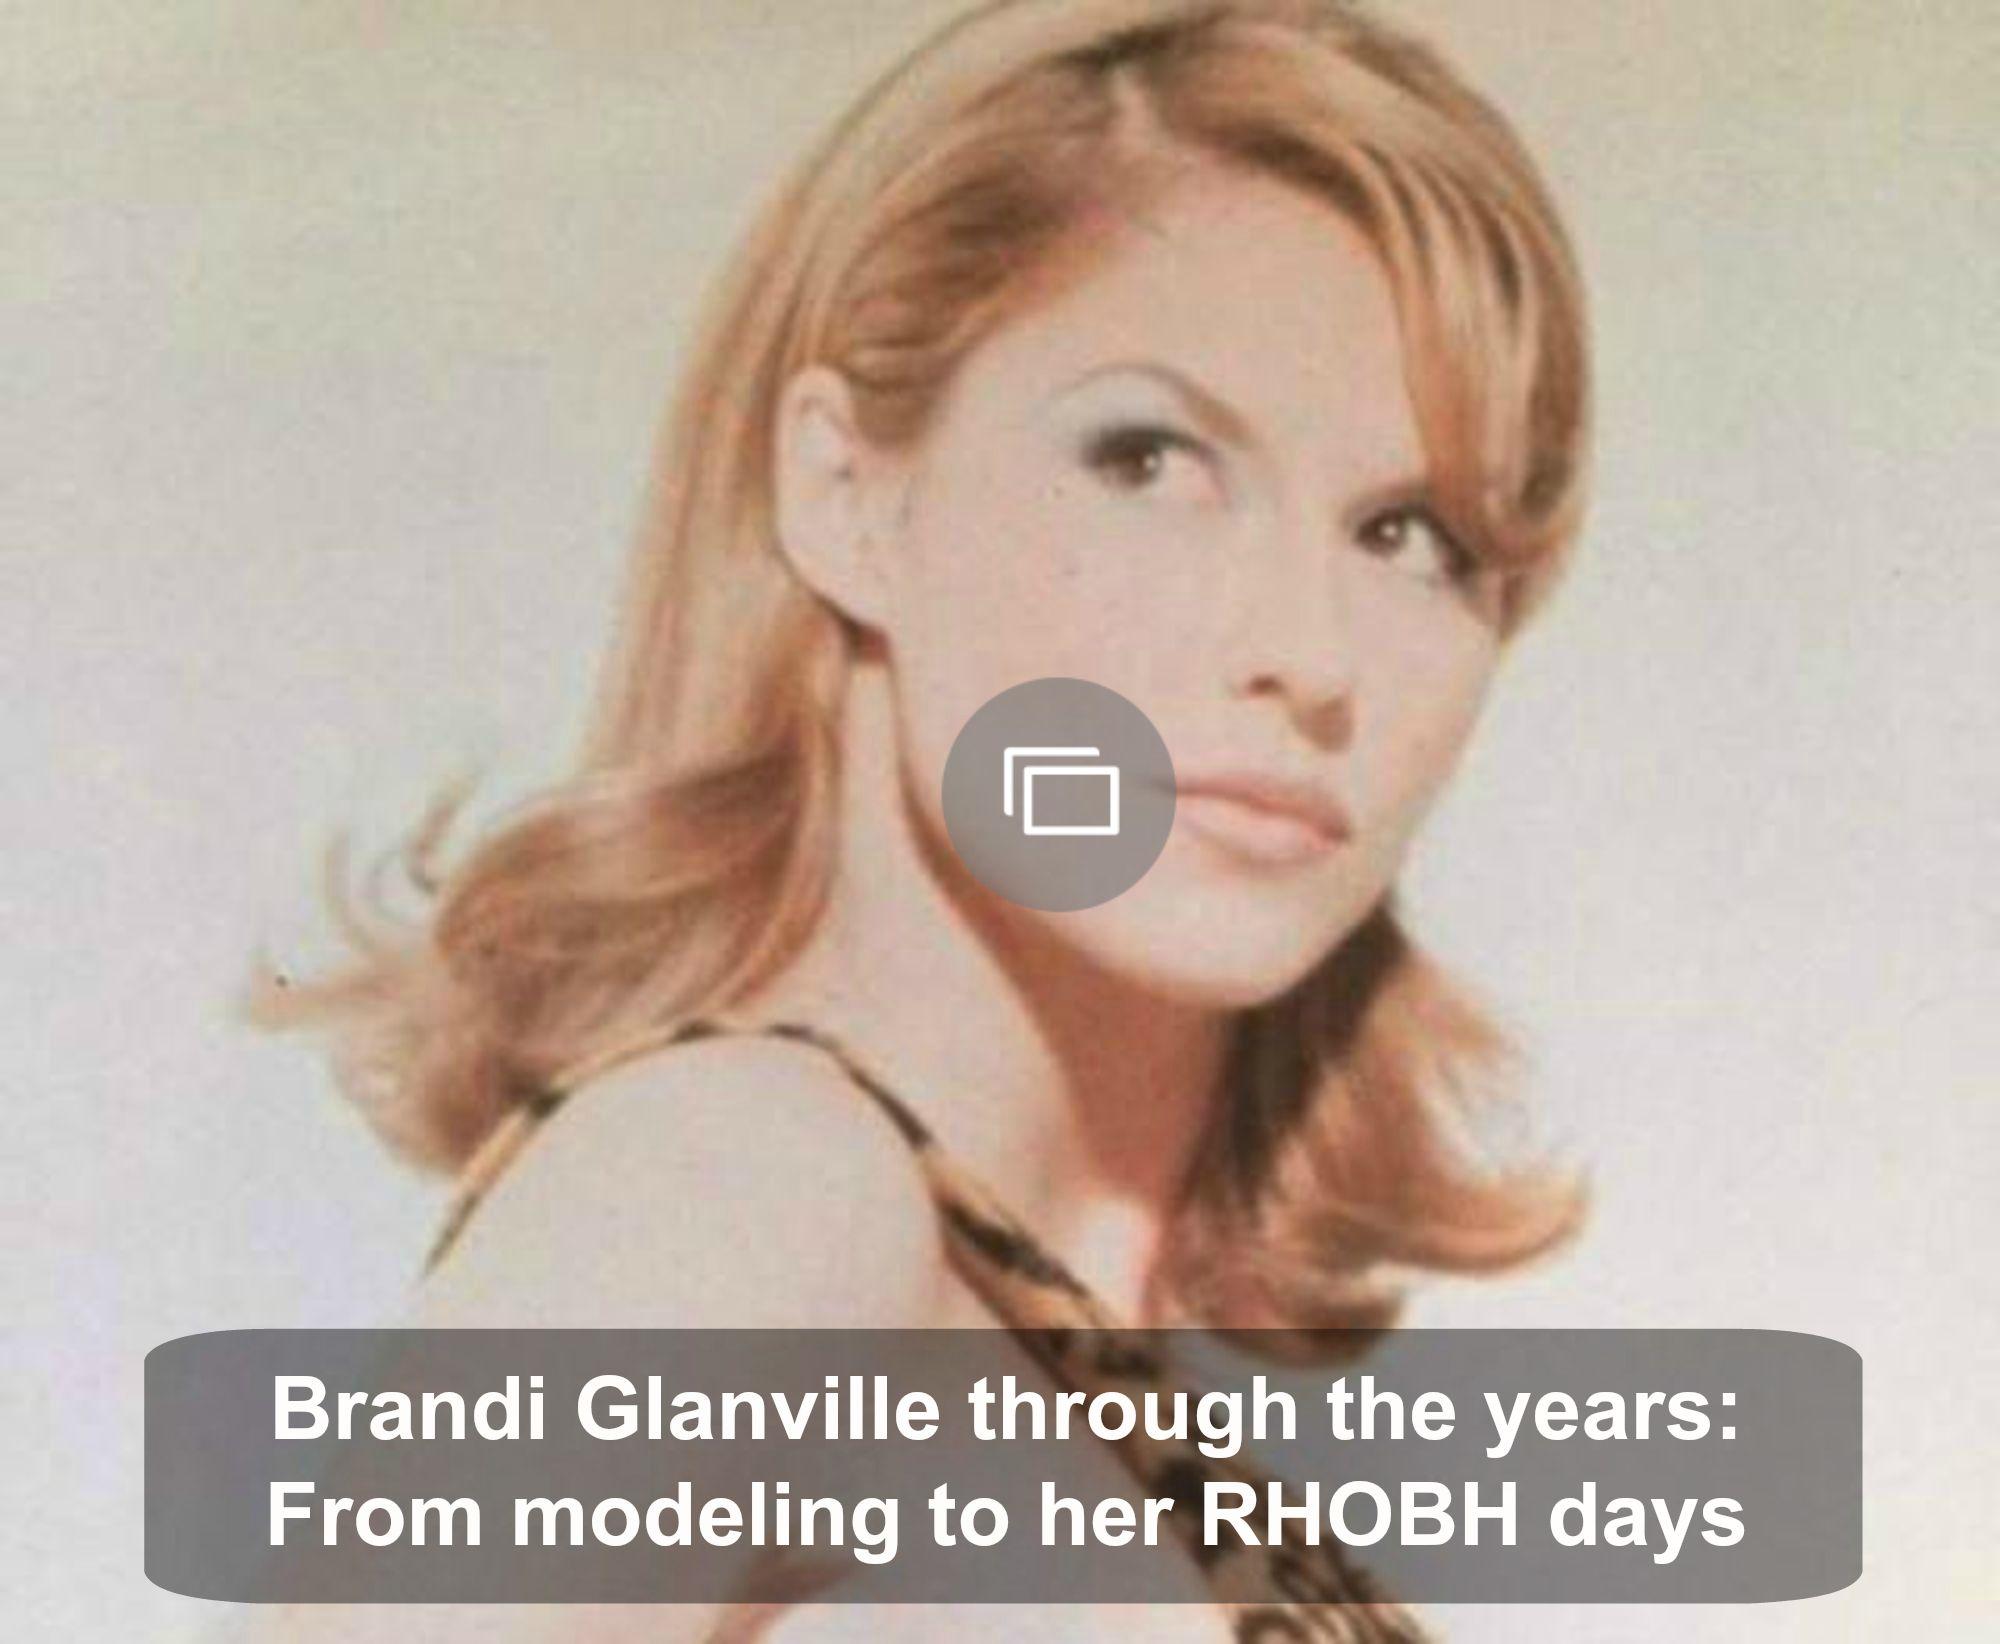 Brandi Glanville through the years